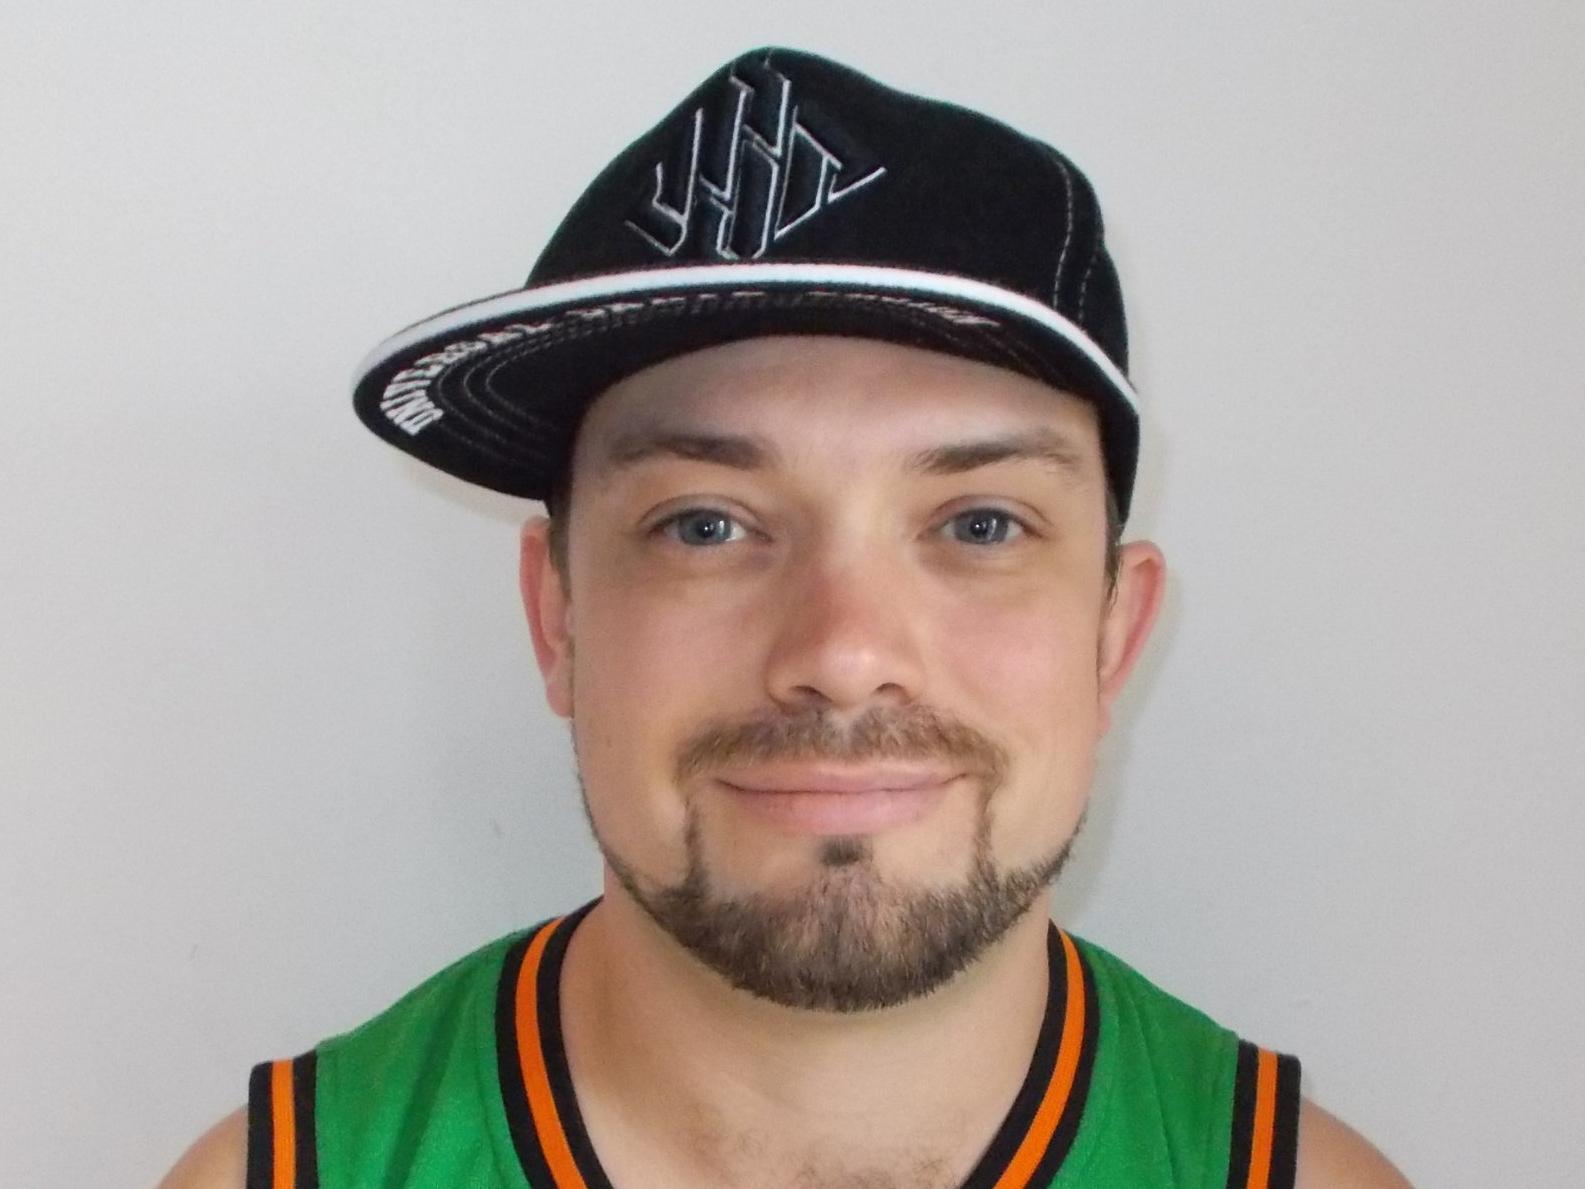 Vinnie Whitehead - Operations Director of Zoo Skatepark